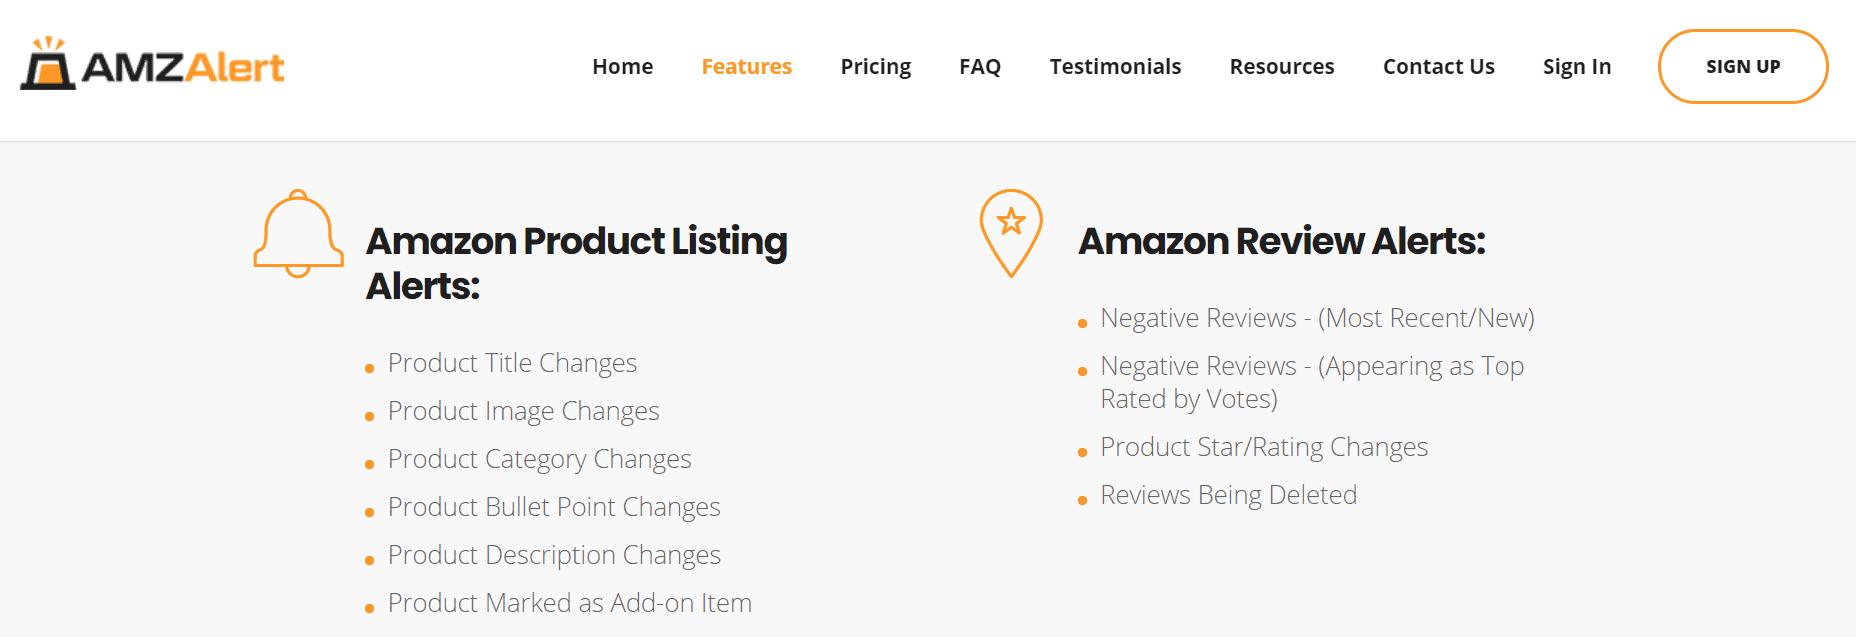 amz alert review- features